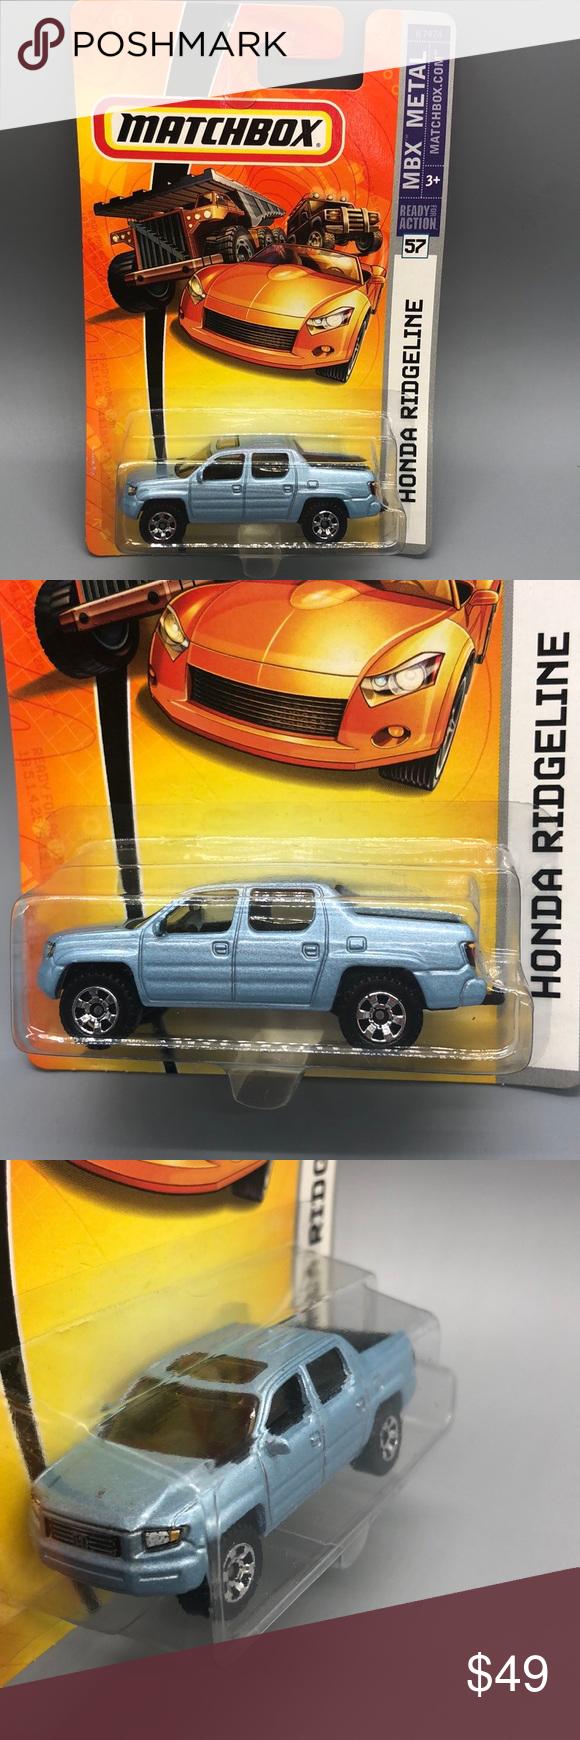 Light Blue Honda : light, honda, Matchbox, Light, HONDA, RIDGELINE, Edition, Honda, Ridgeline,, Matchbox,